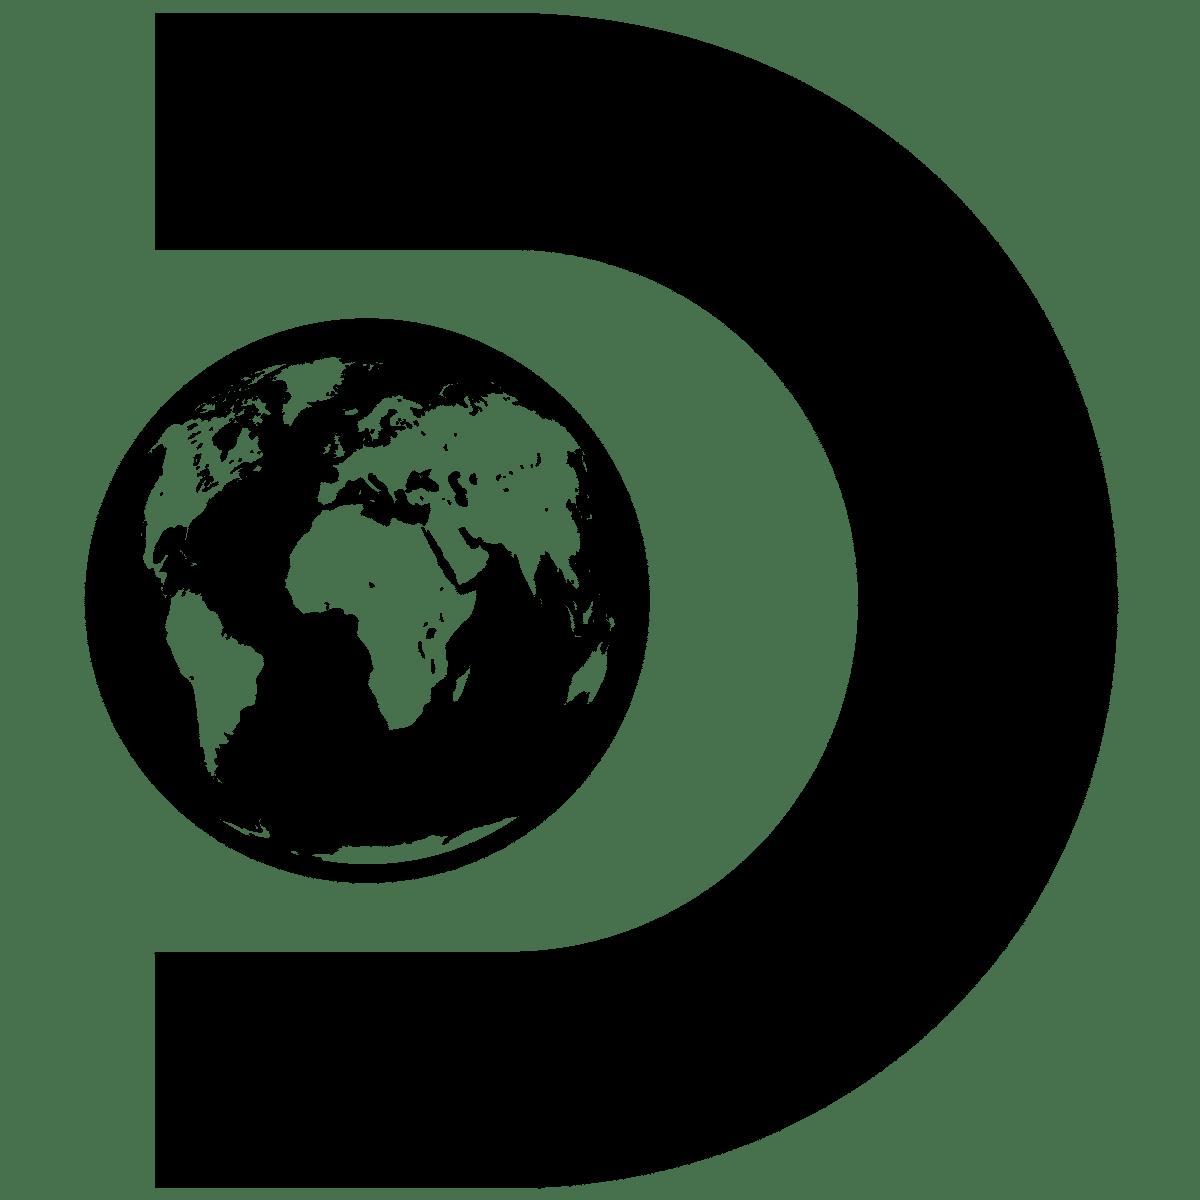 Discover Education logo